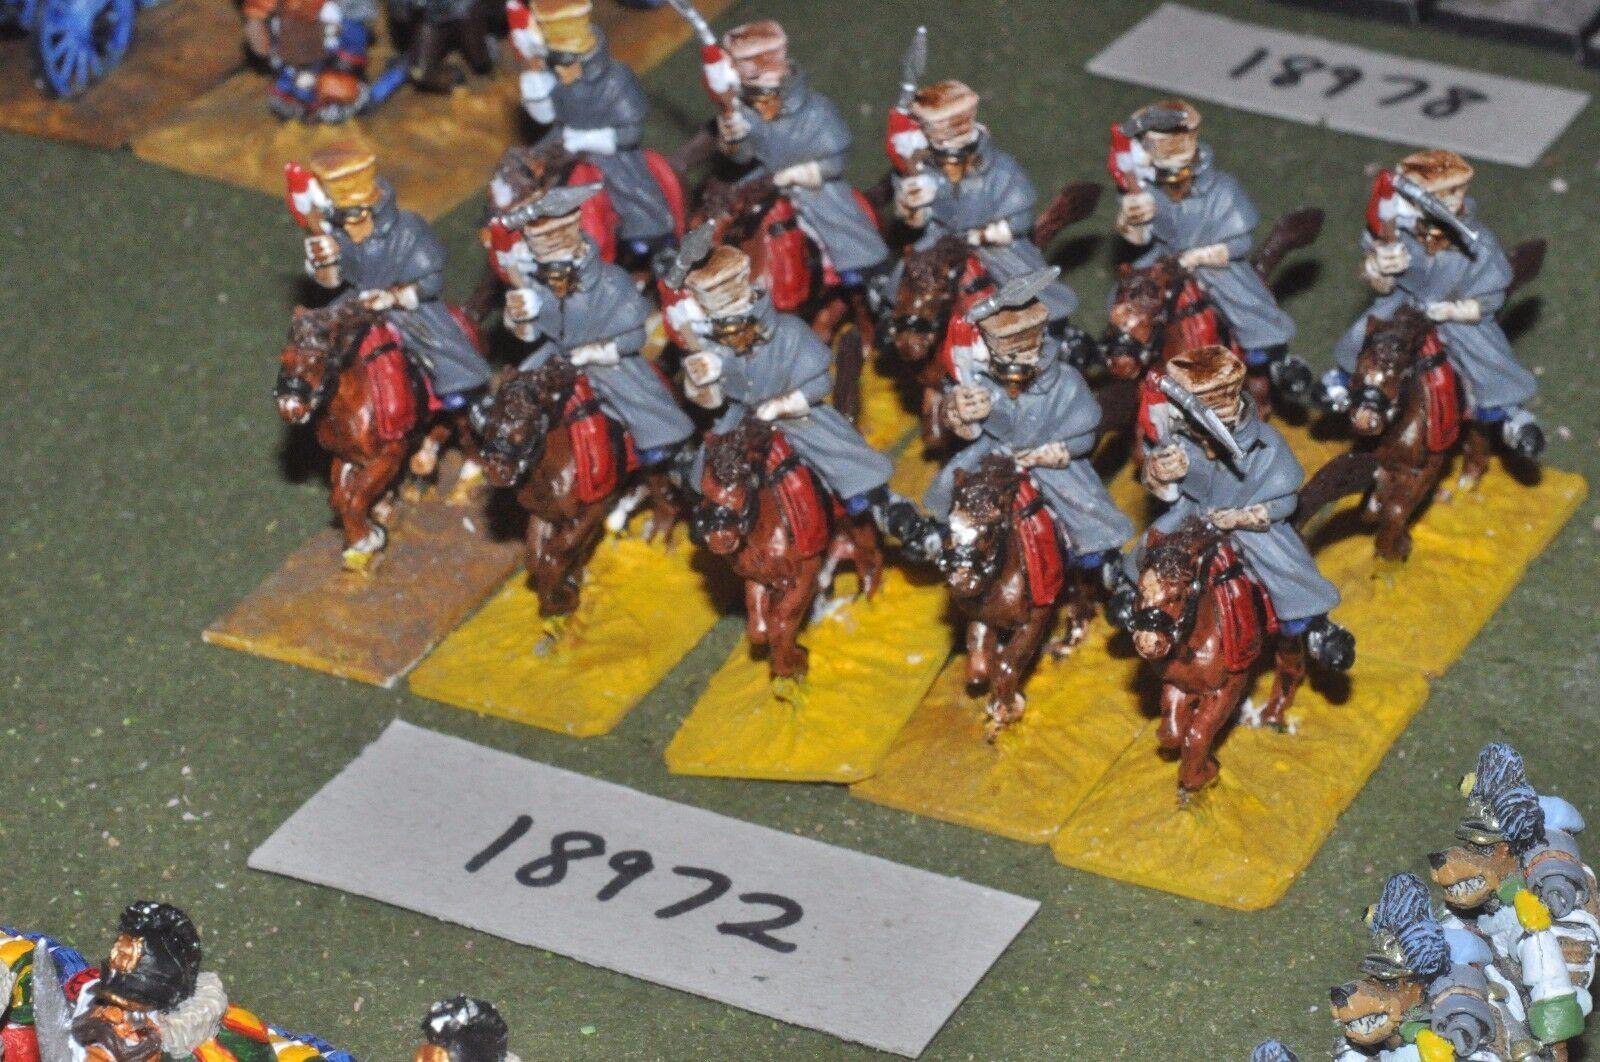 2008 flintloque fantasy - elf chevaulegers kavallerie kavallerie [16]] (10 18972)